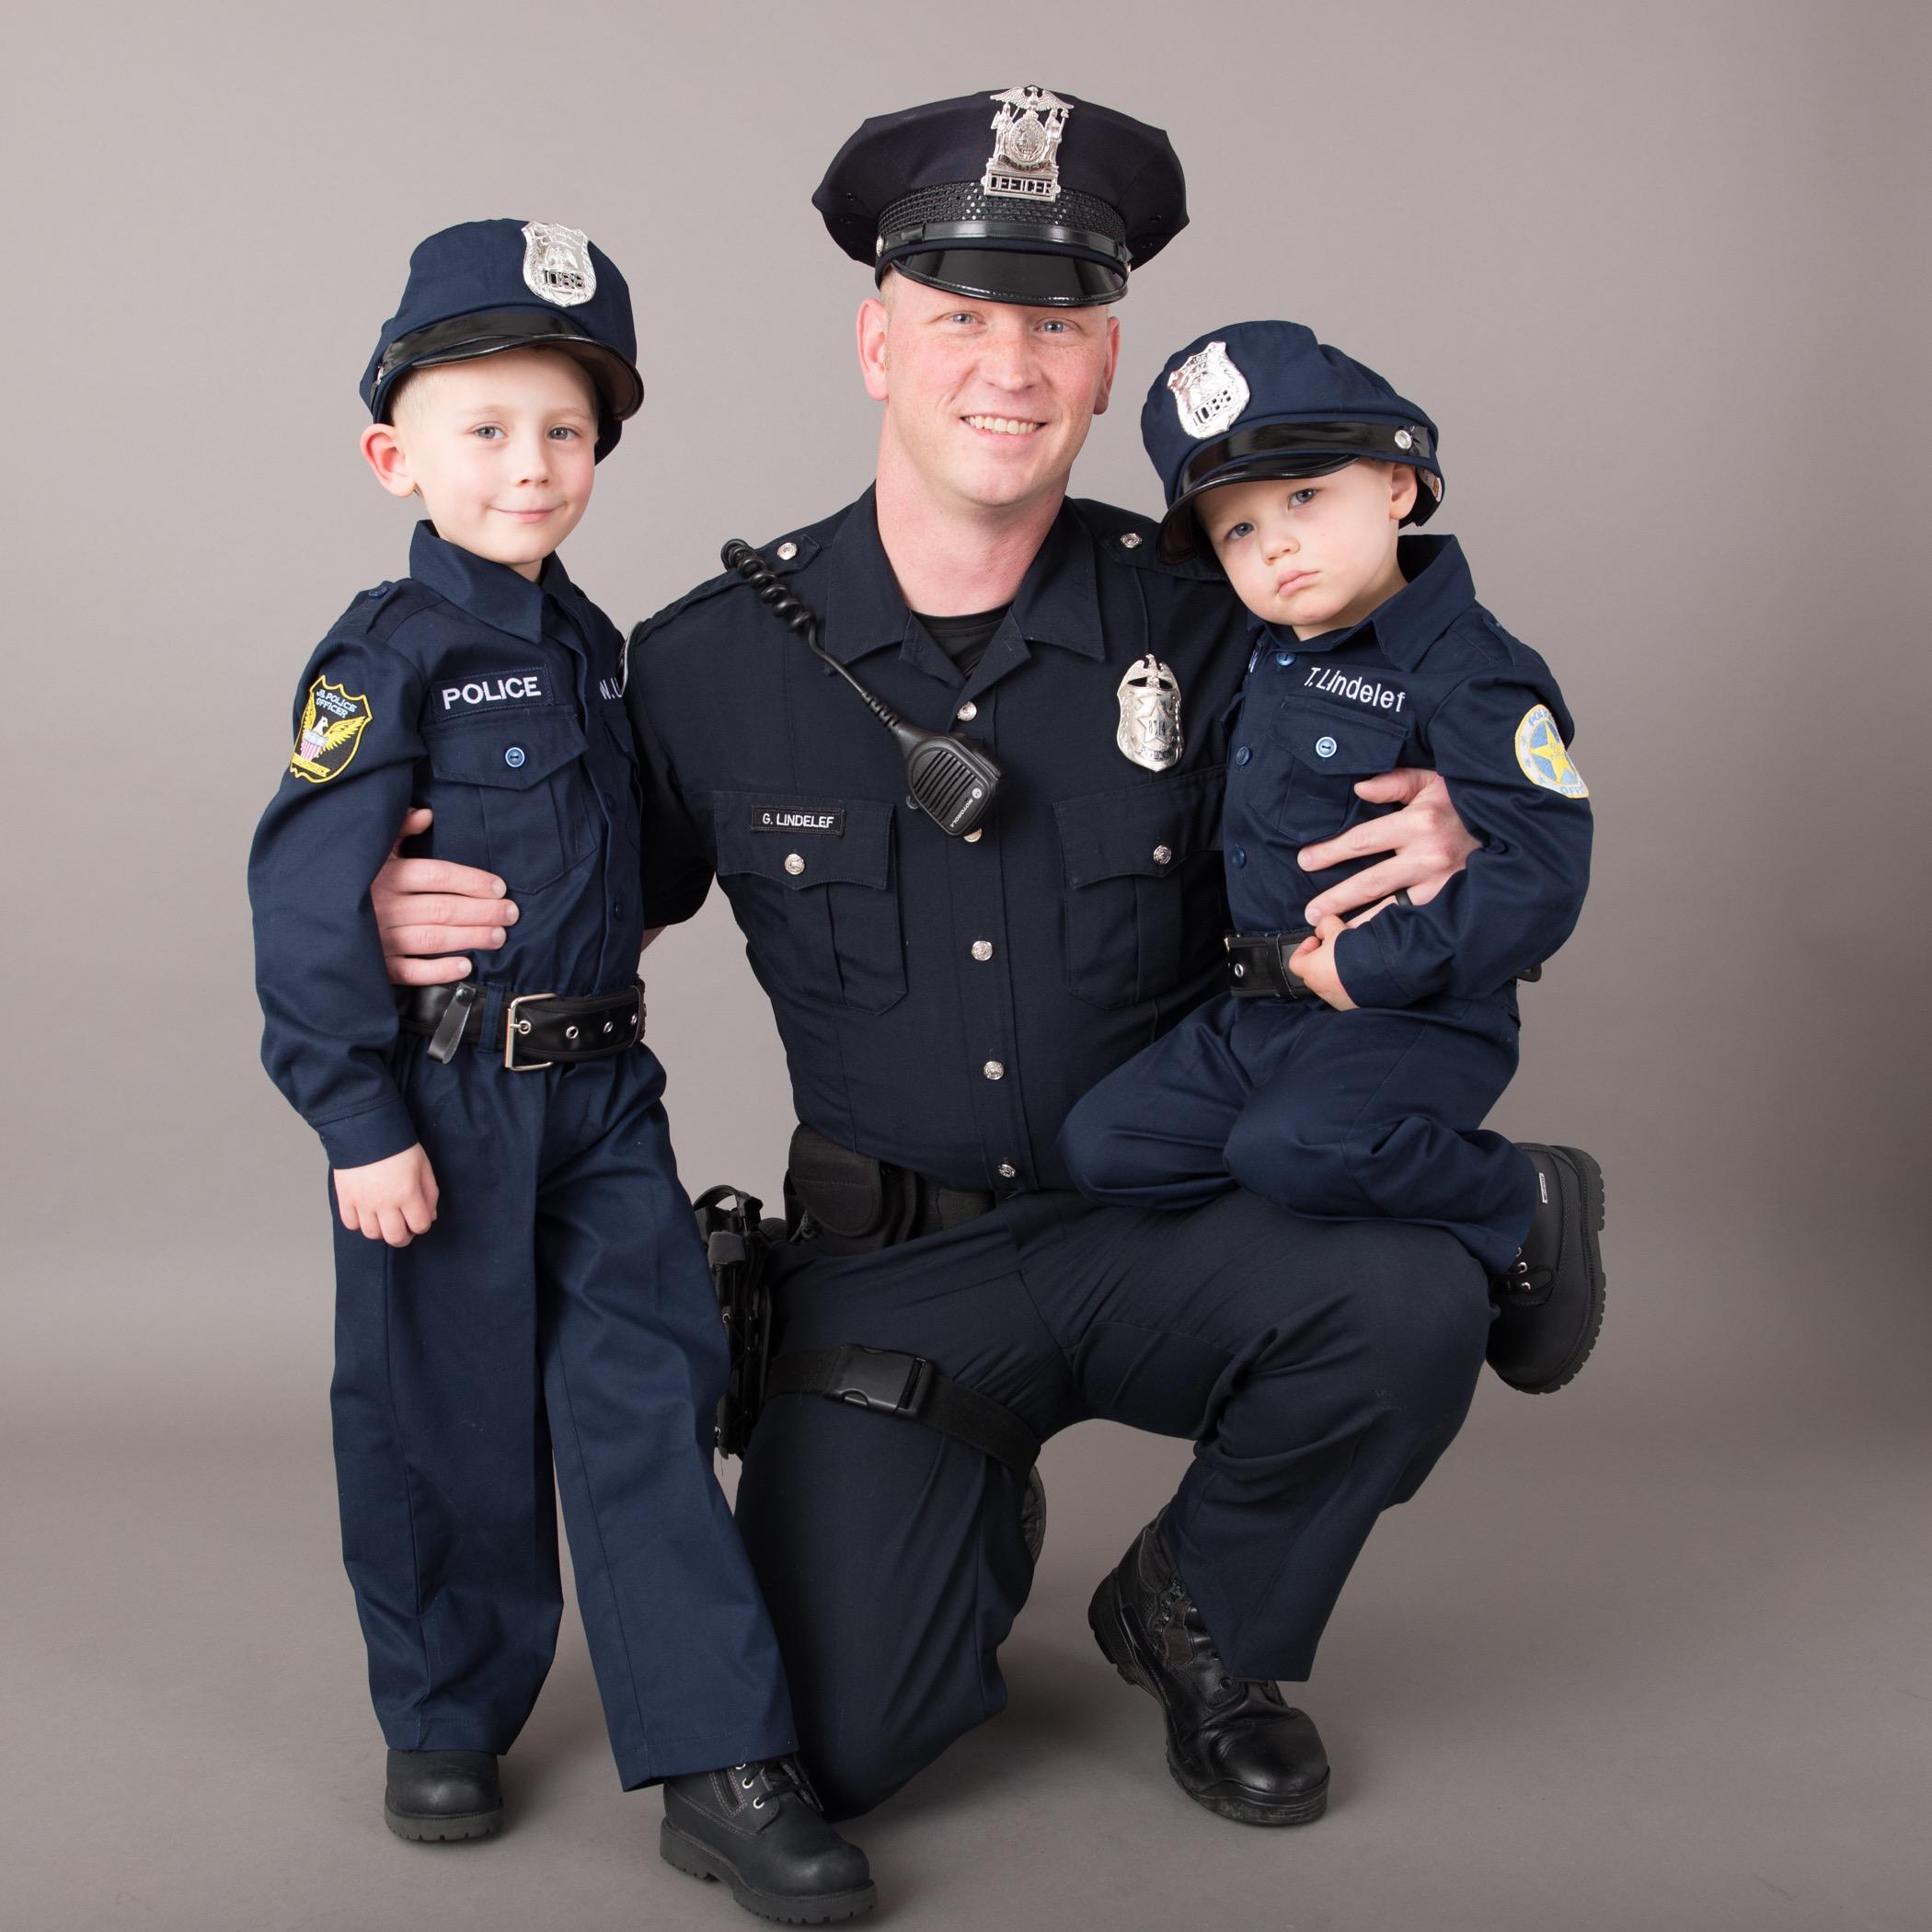 Cop uniforms real Kids' SWAT